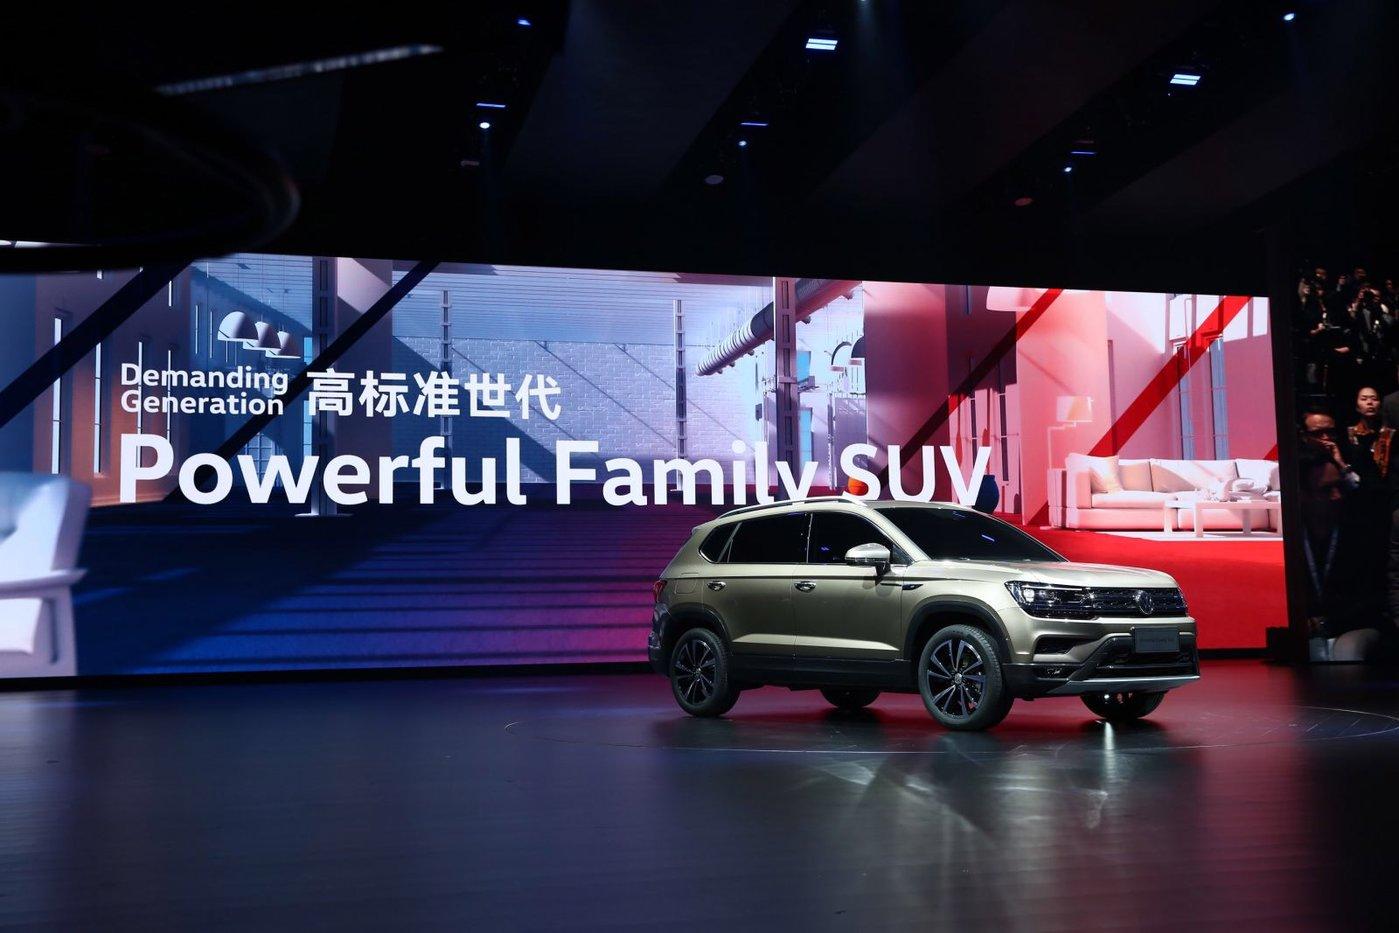 Powerful Family SUV